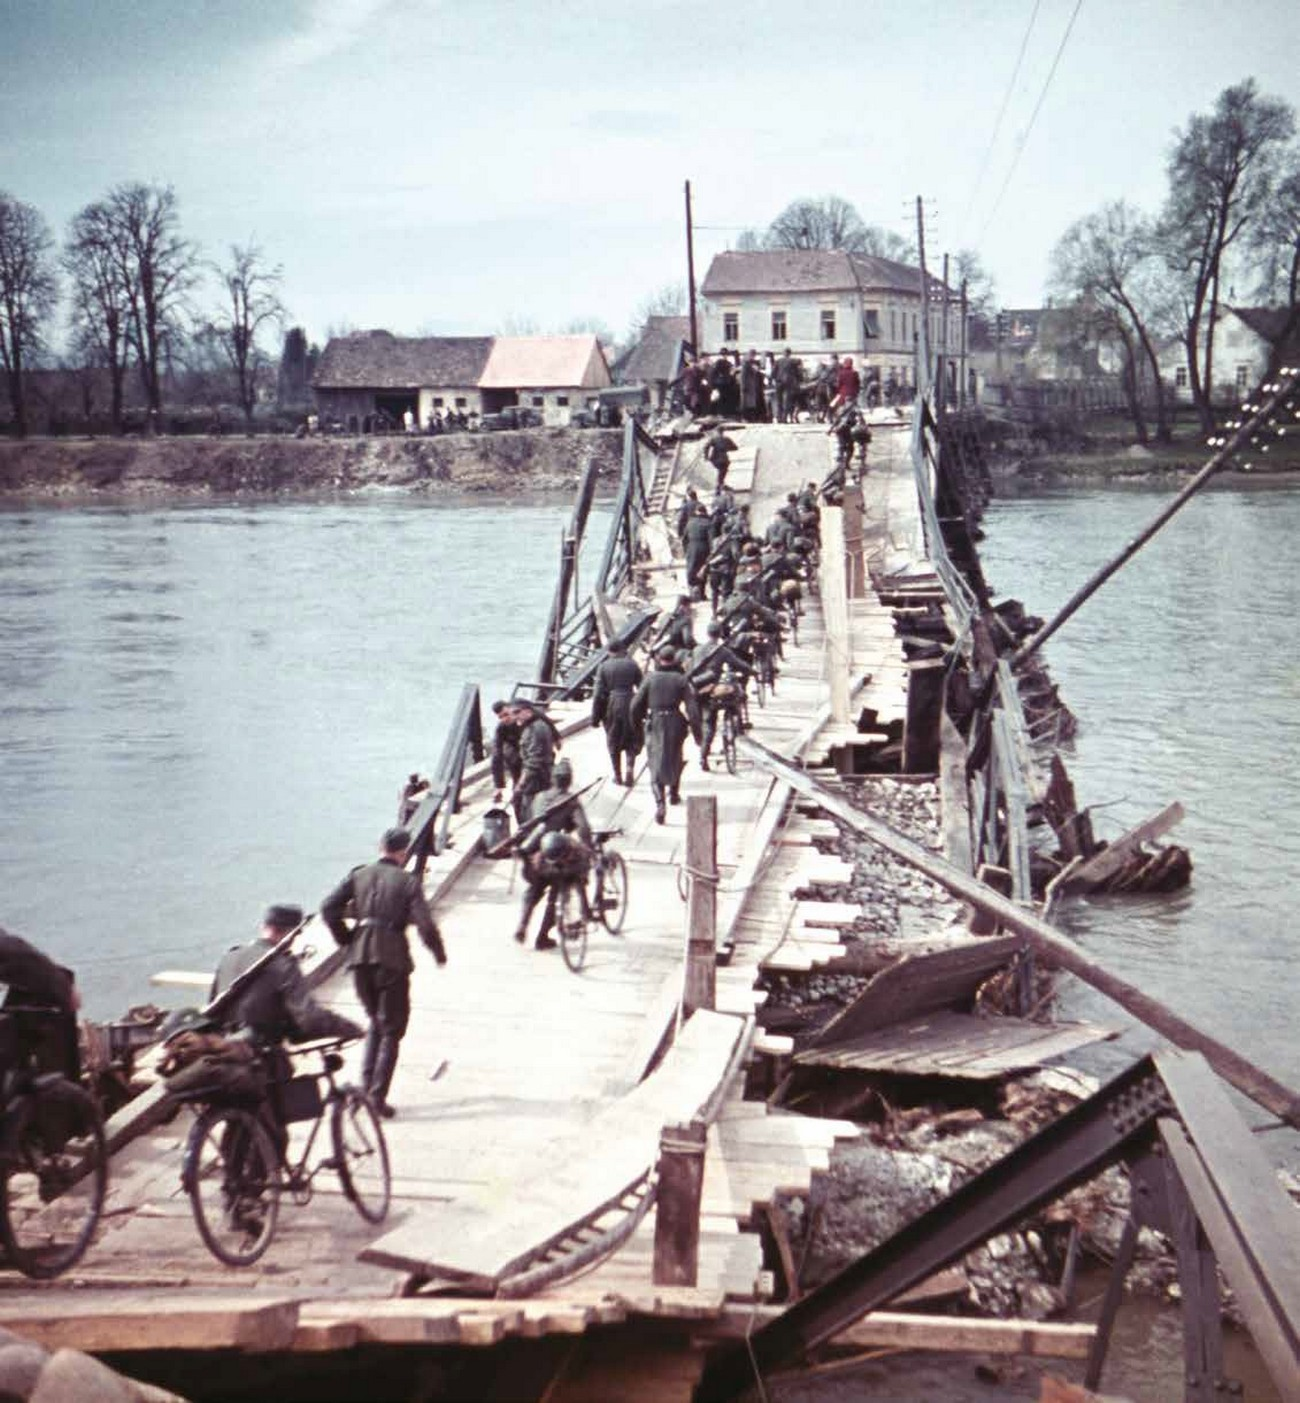 German Army crossing the Drava River across a demolished bridge, Ptuj, 1941. MNZS.